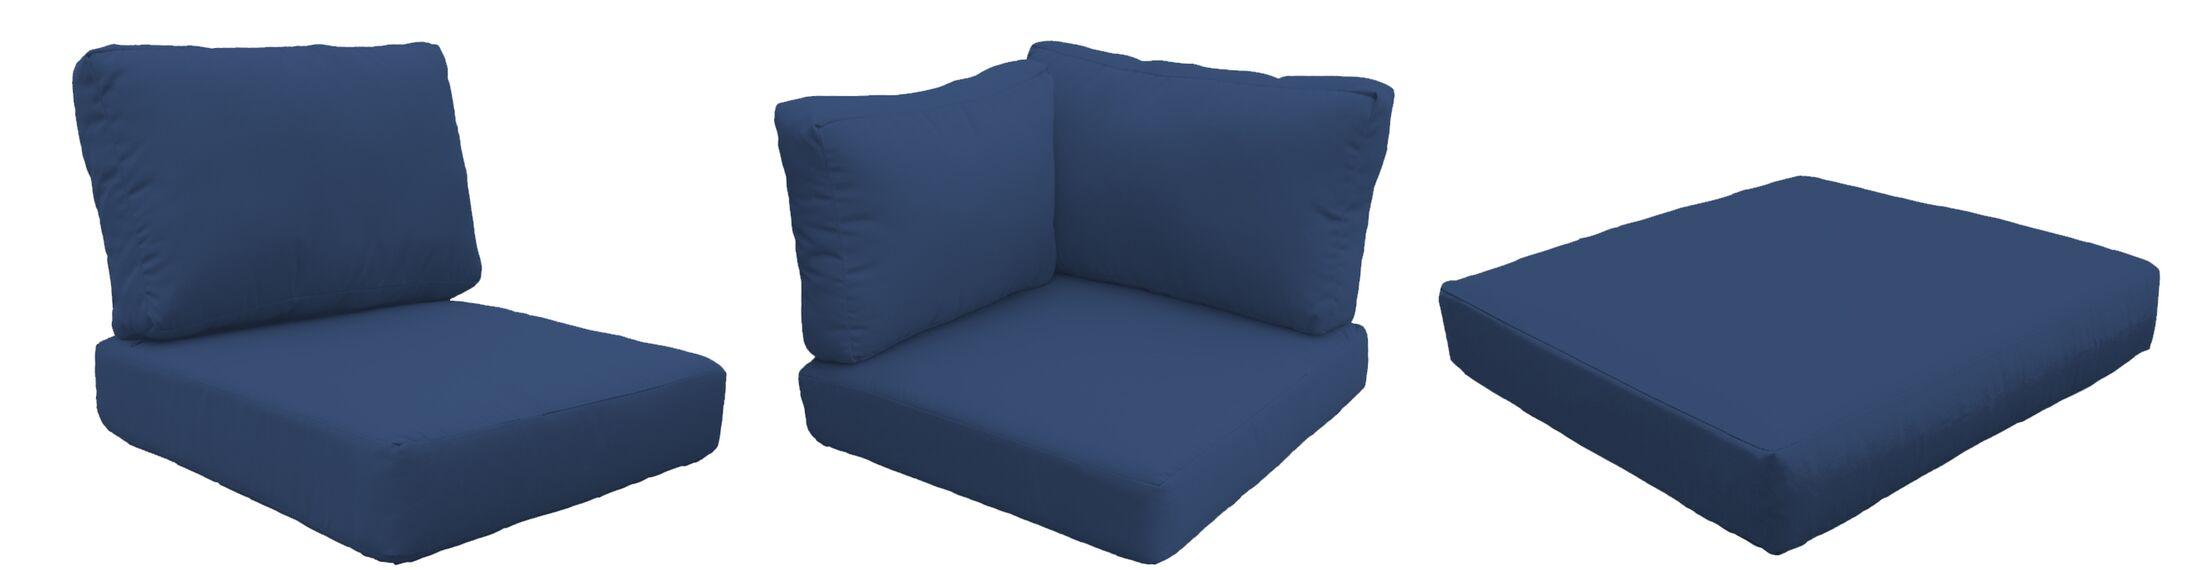 Barbados 18 Piece Outdoor Cushion Set Fabric: Navy